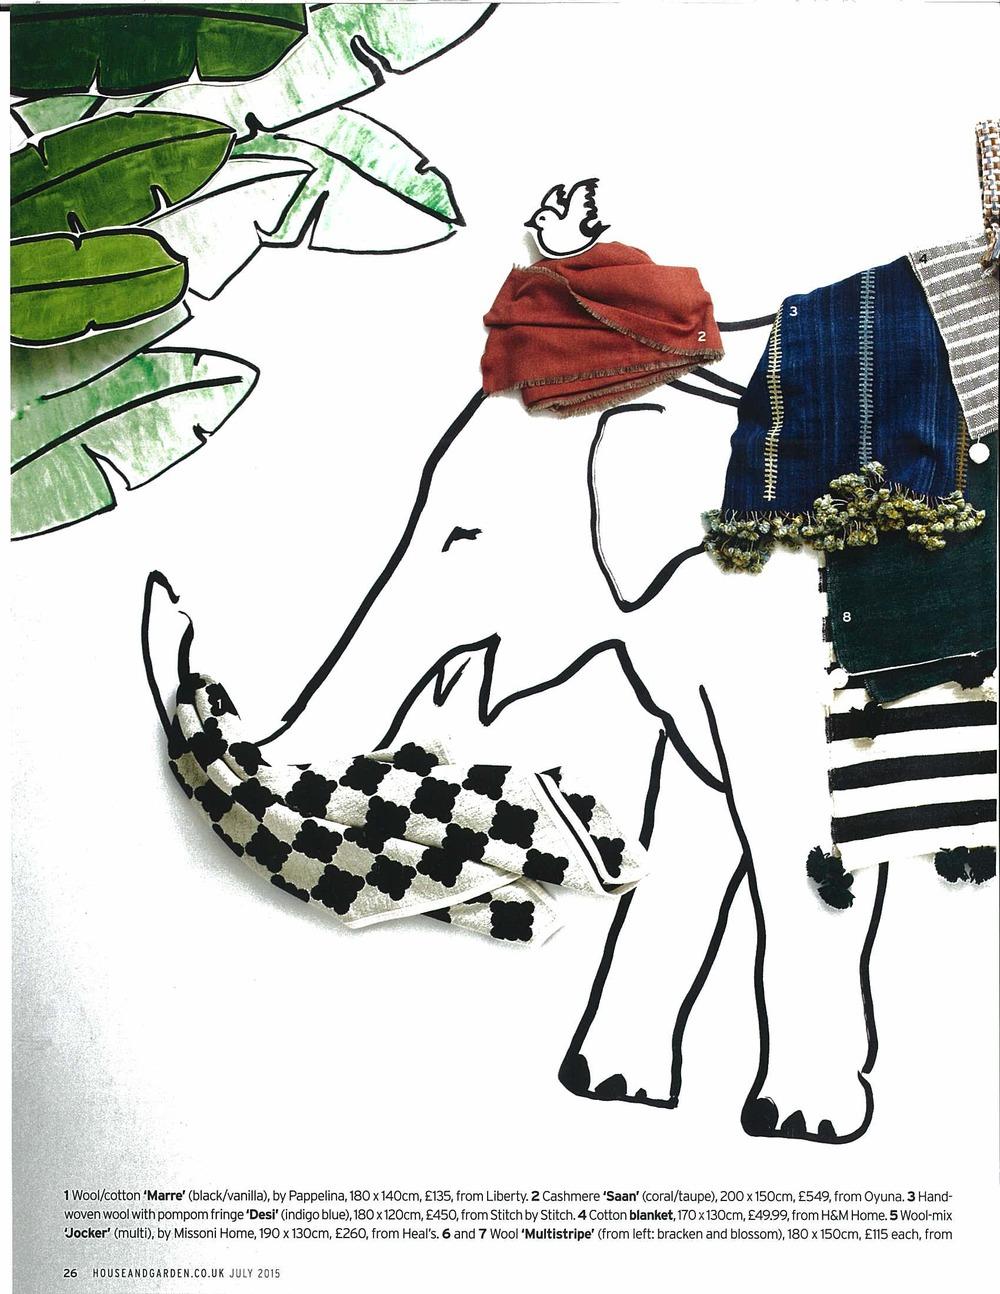 House and Garden, July 2015: Desi Pom Pom indigo blanket (no.3)